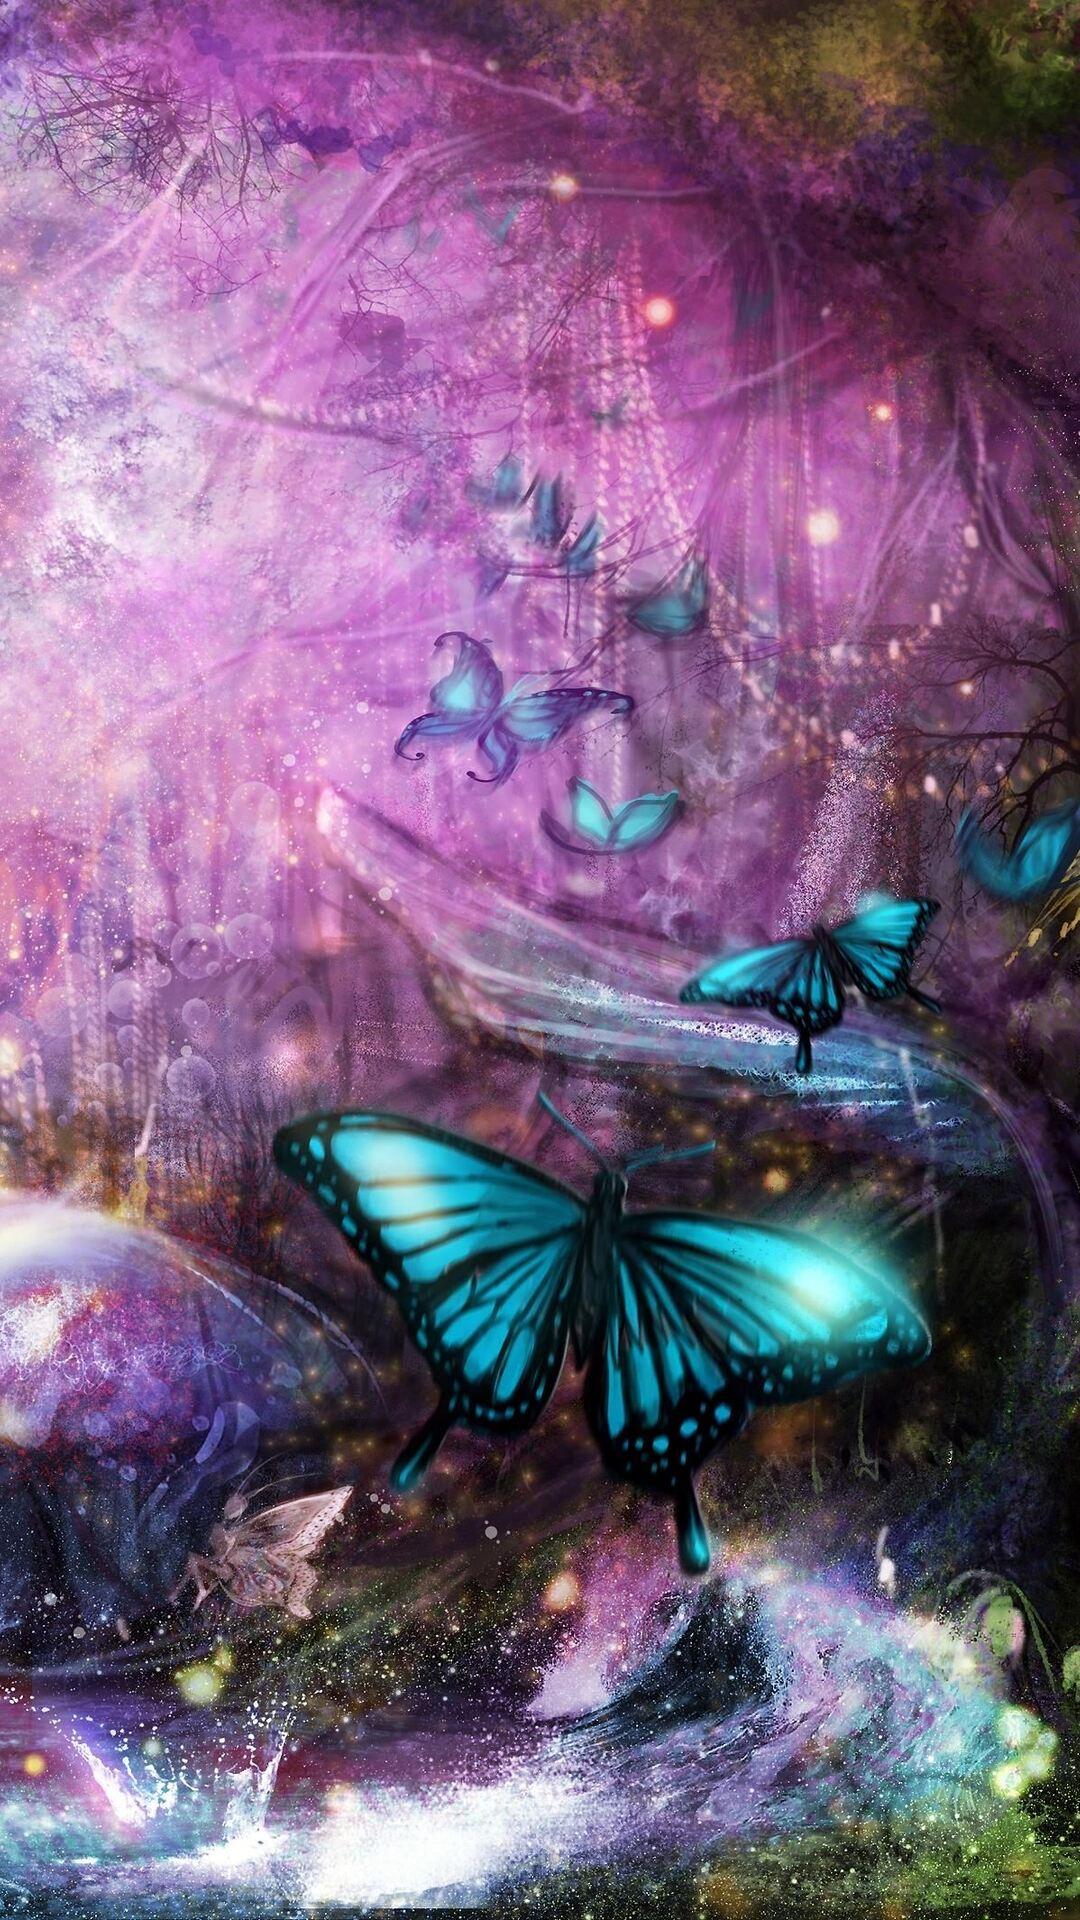 butterfly-fantasy-qhd.jpg